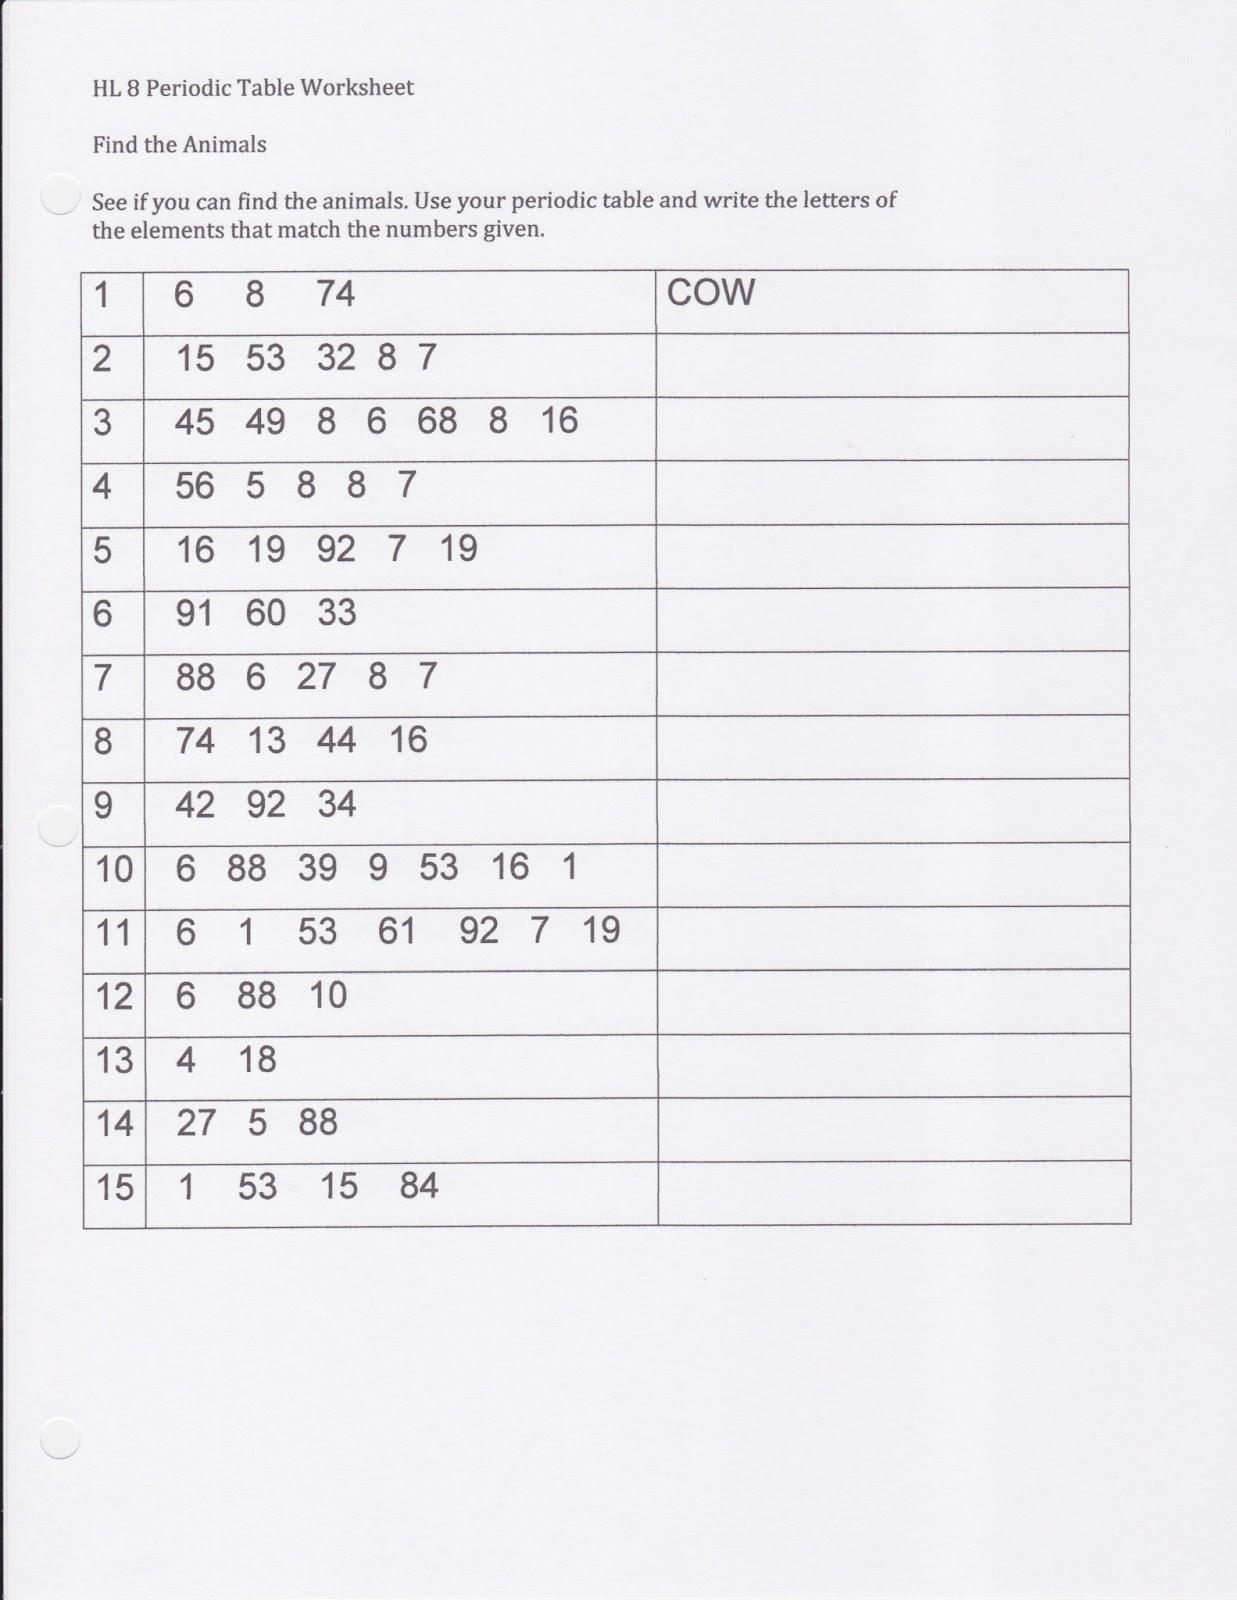 Periodic Table Worksheet Pdf   www.imgkid.com - The Image ...